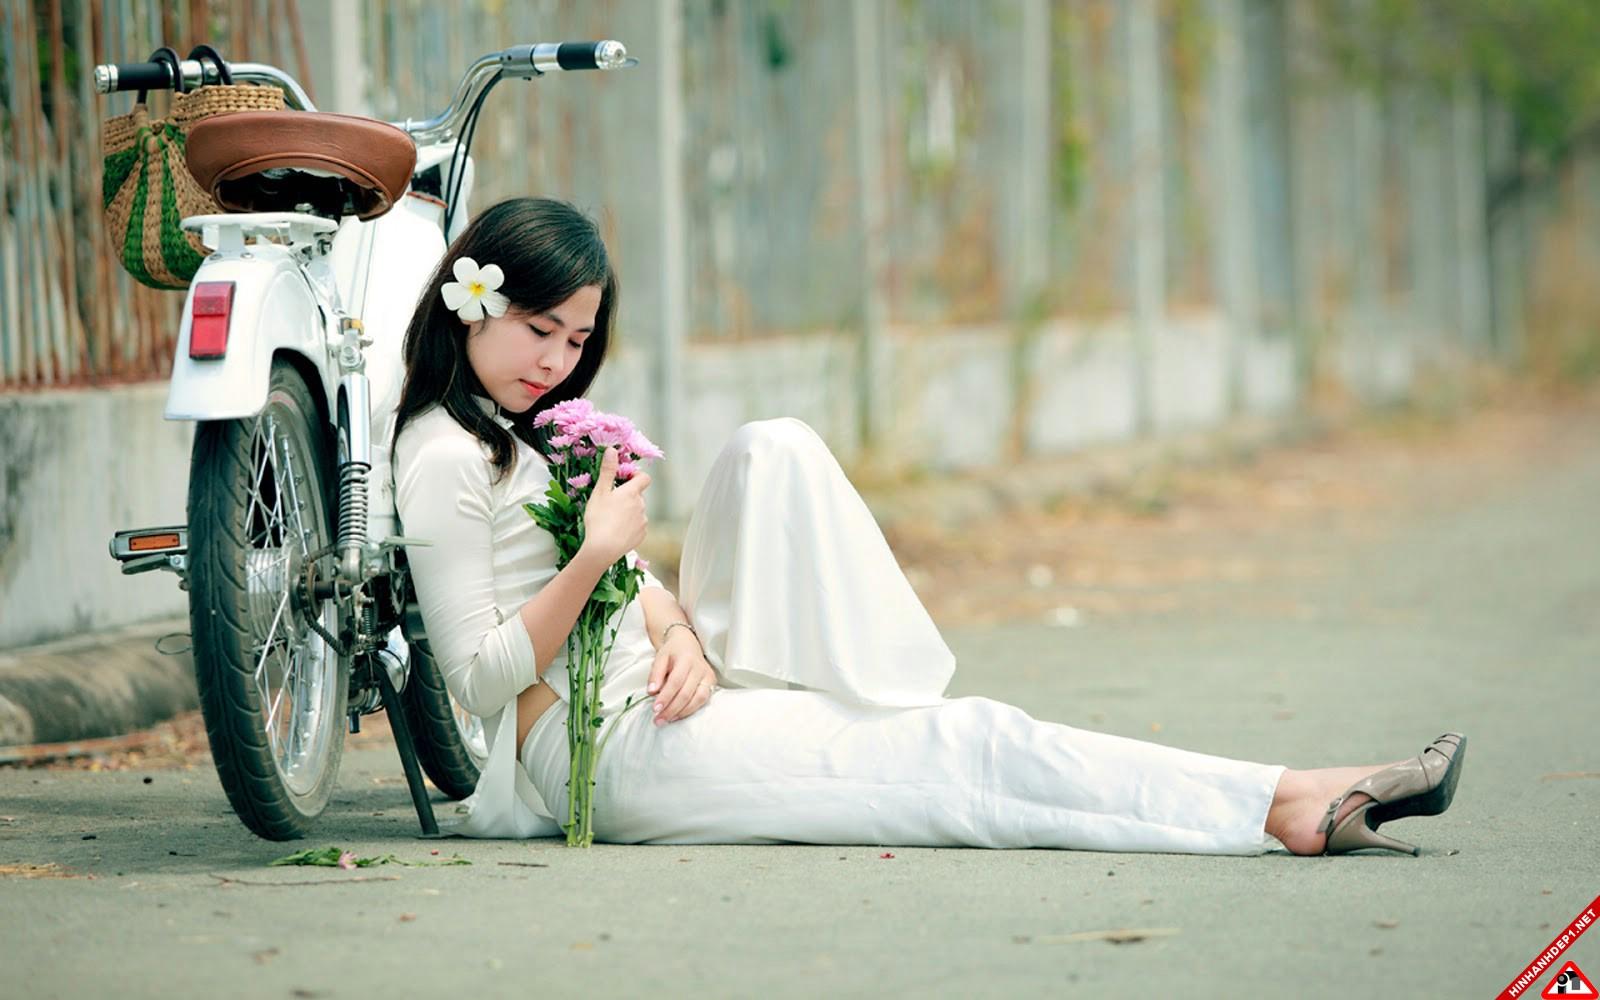 bo-anh-girl-xinh-cung-huong-dong-gio-noi (4)